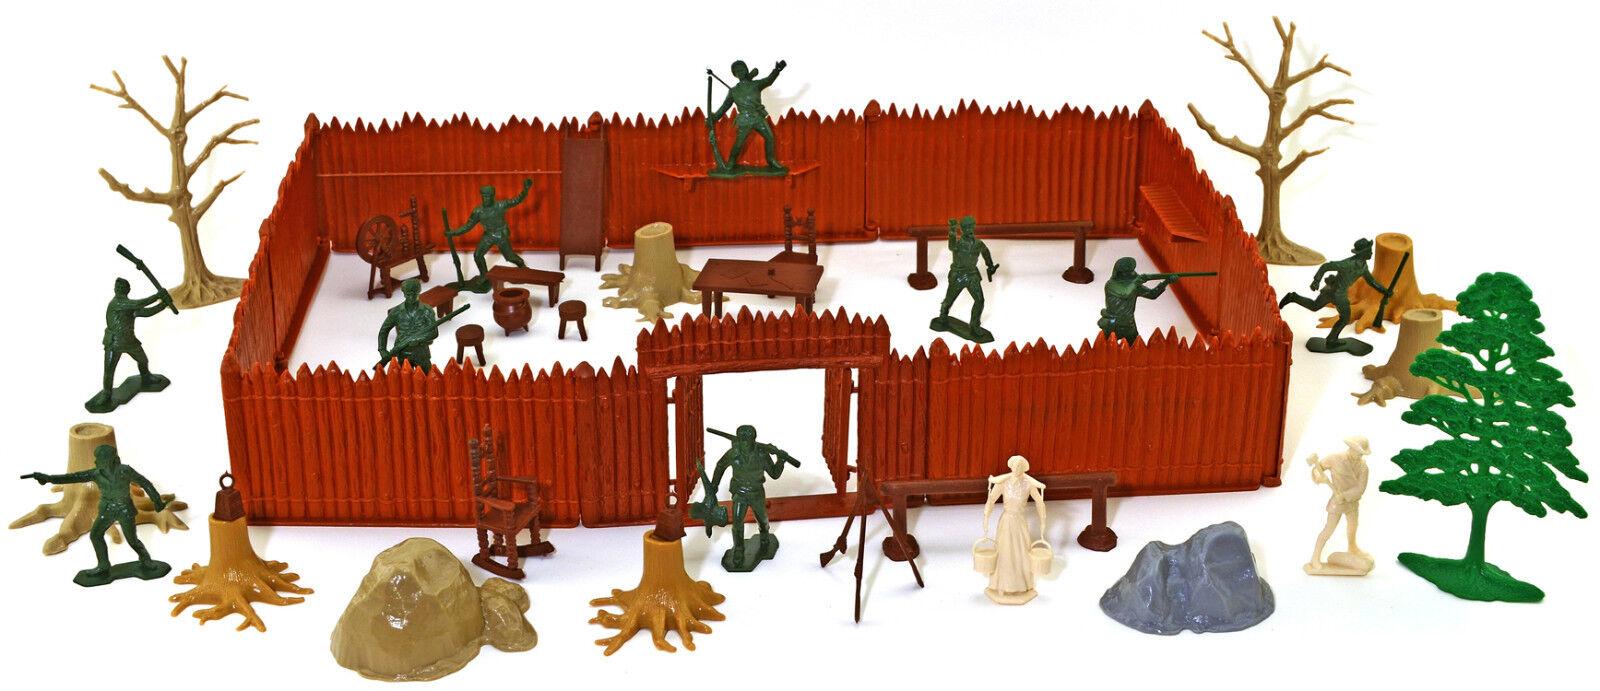 Marx Recast Boonesbgold Bundle - 54mm unpainted figures and accessories